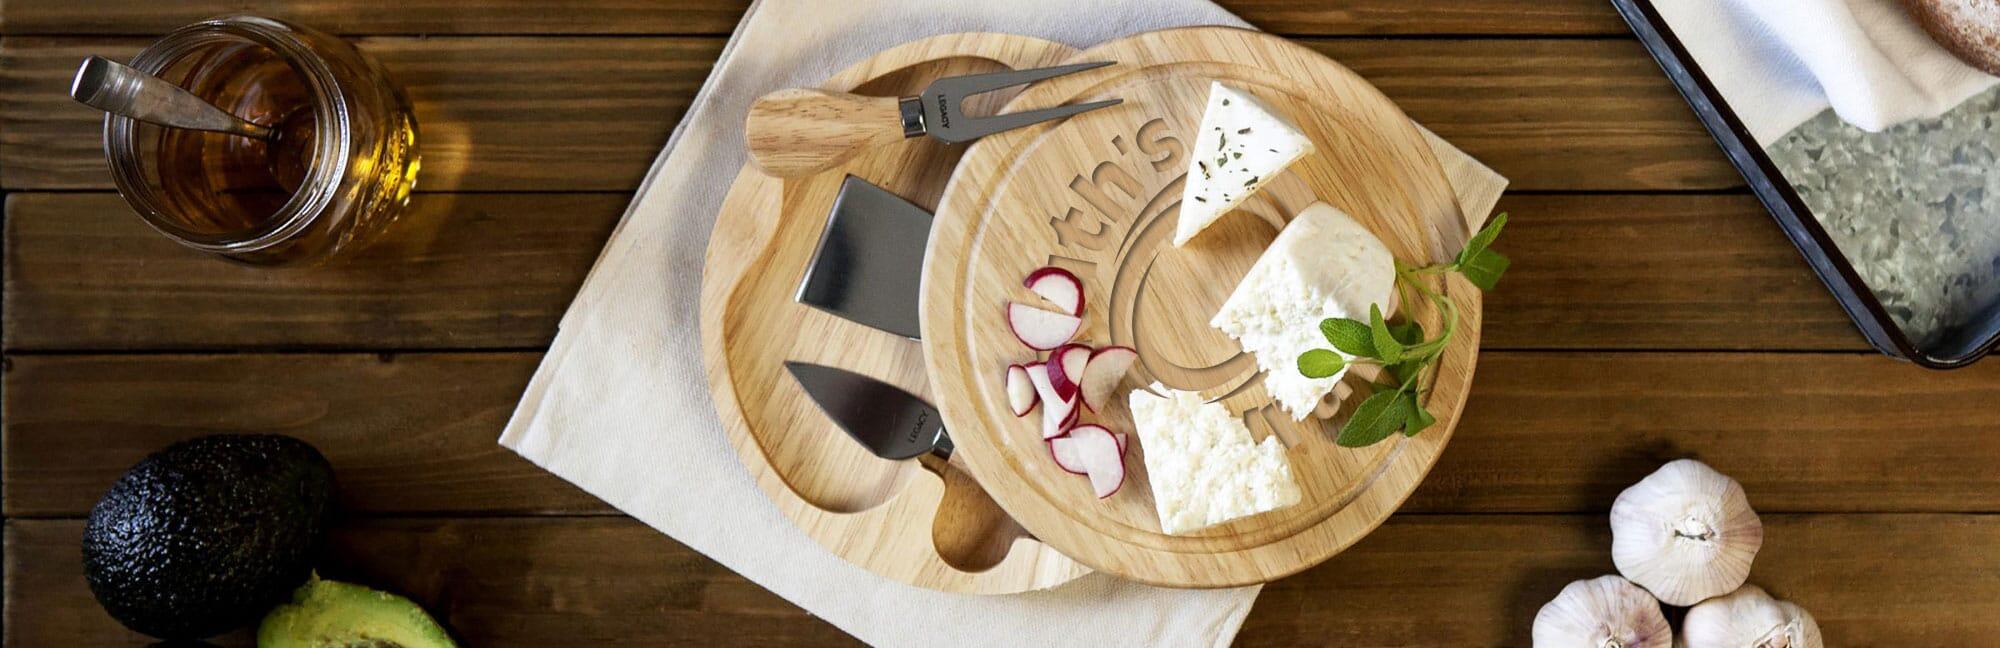 Customized cheeseboard gift